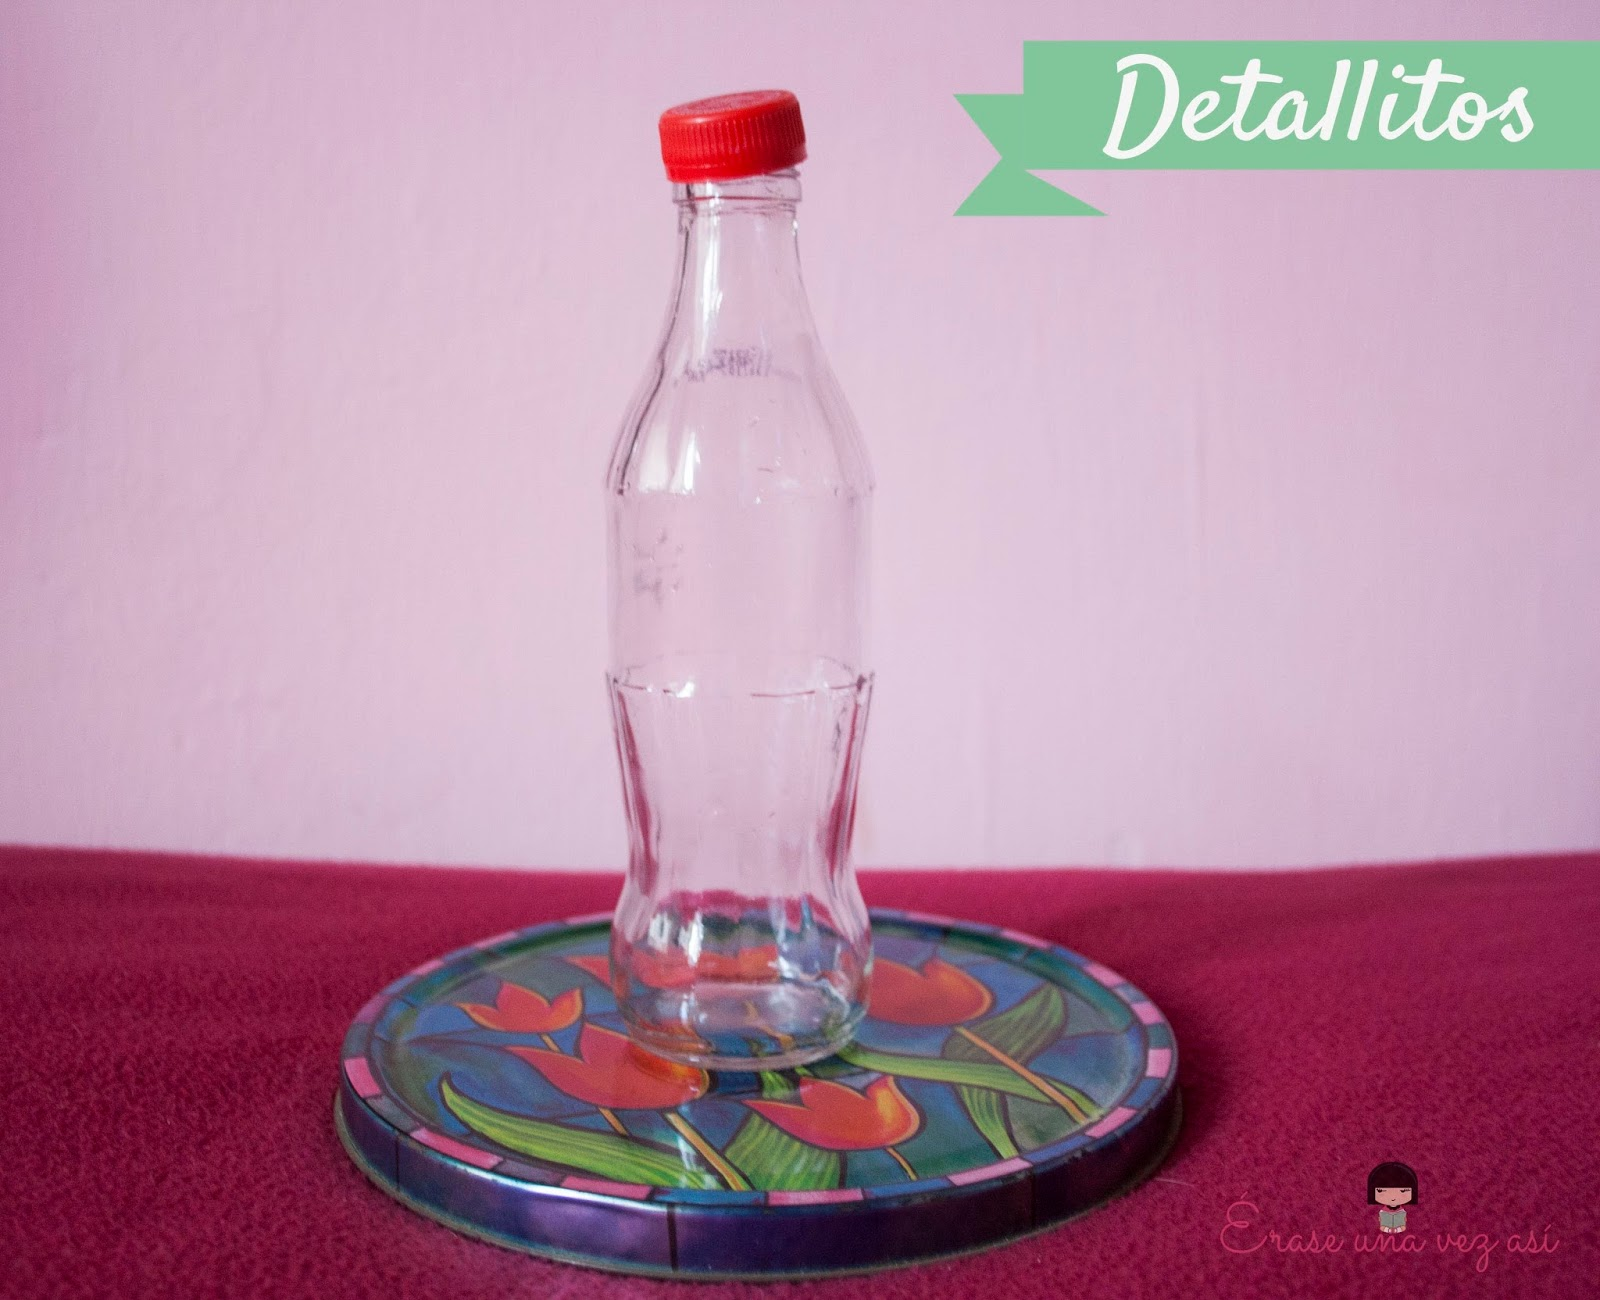 Florero de botella decorativa, reciclaje de vidrio, reciclaje de botella, manualidades con botellas, manualidades para decorar la casa, manualidades faciles, manualidades con amor